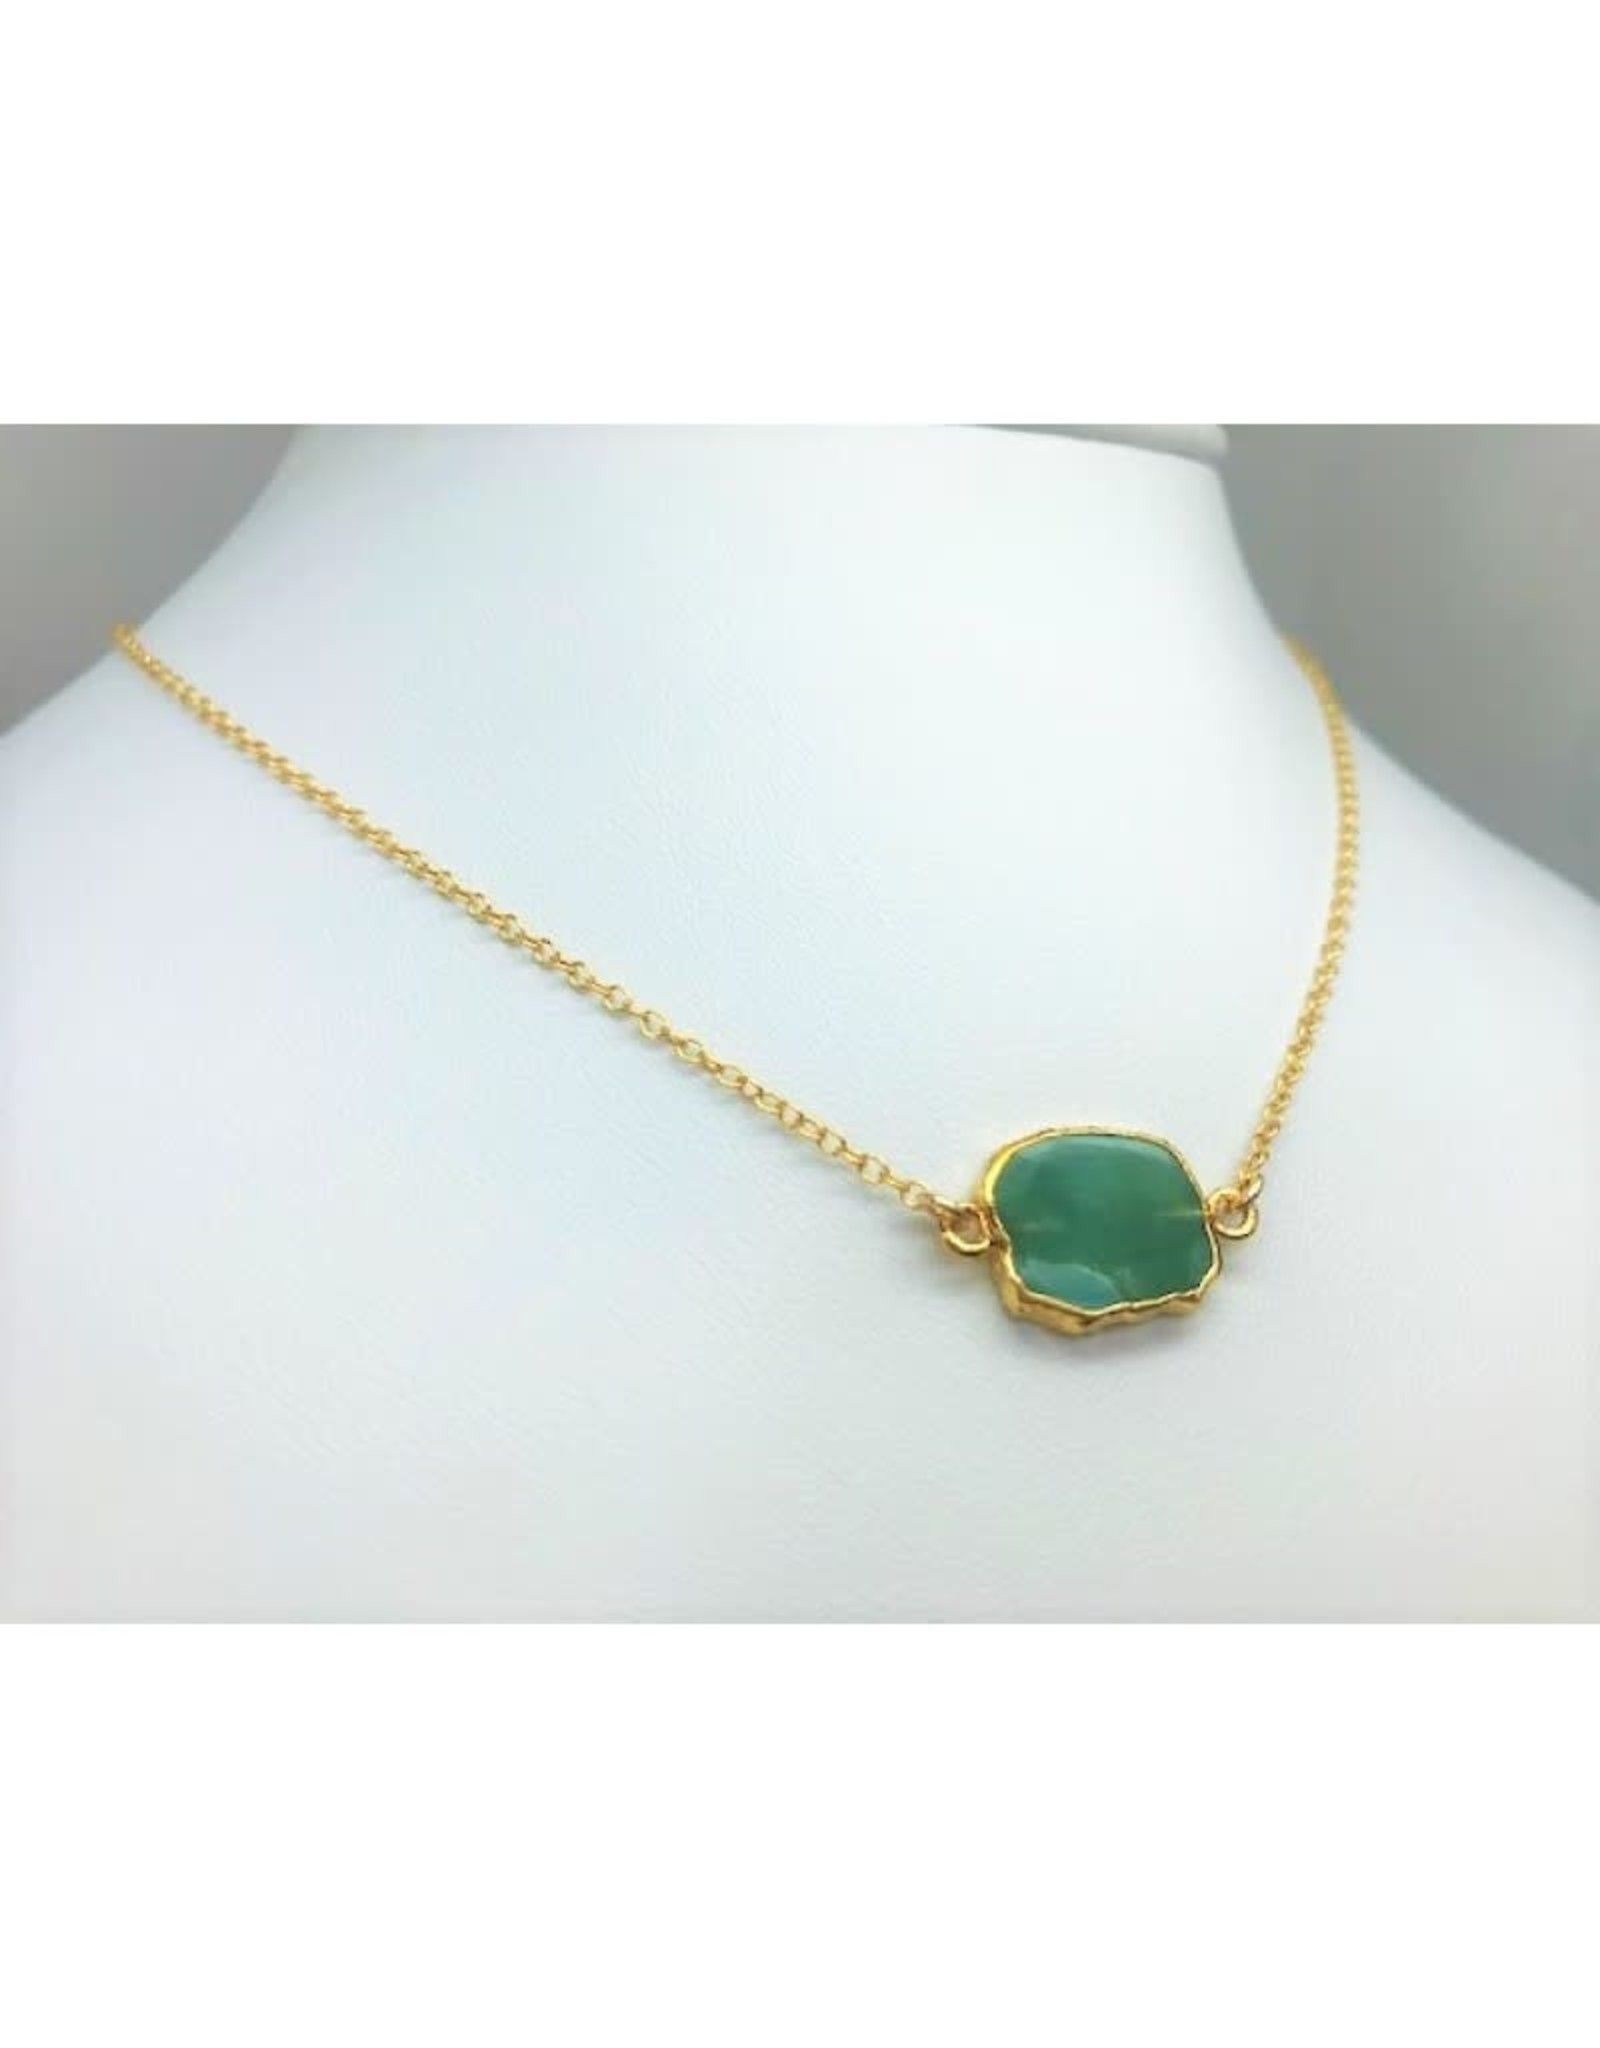 Gemstone Slice Necklace - Emerald